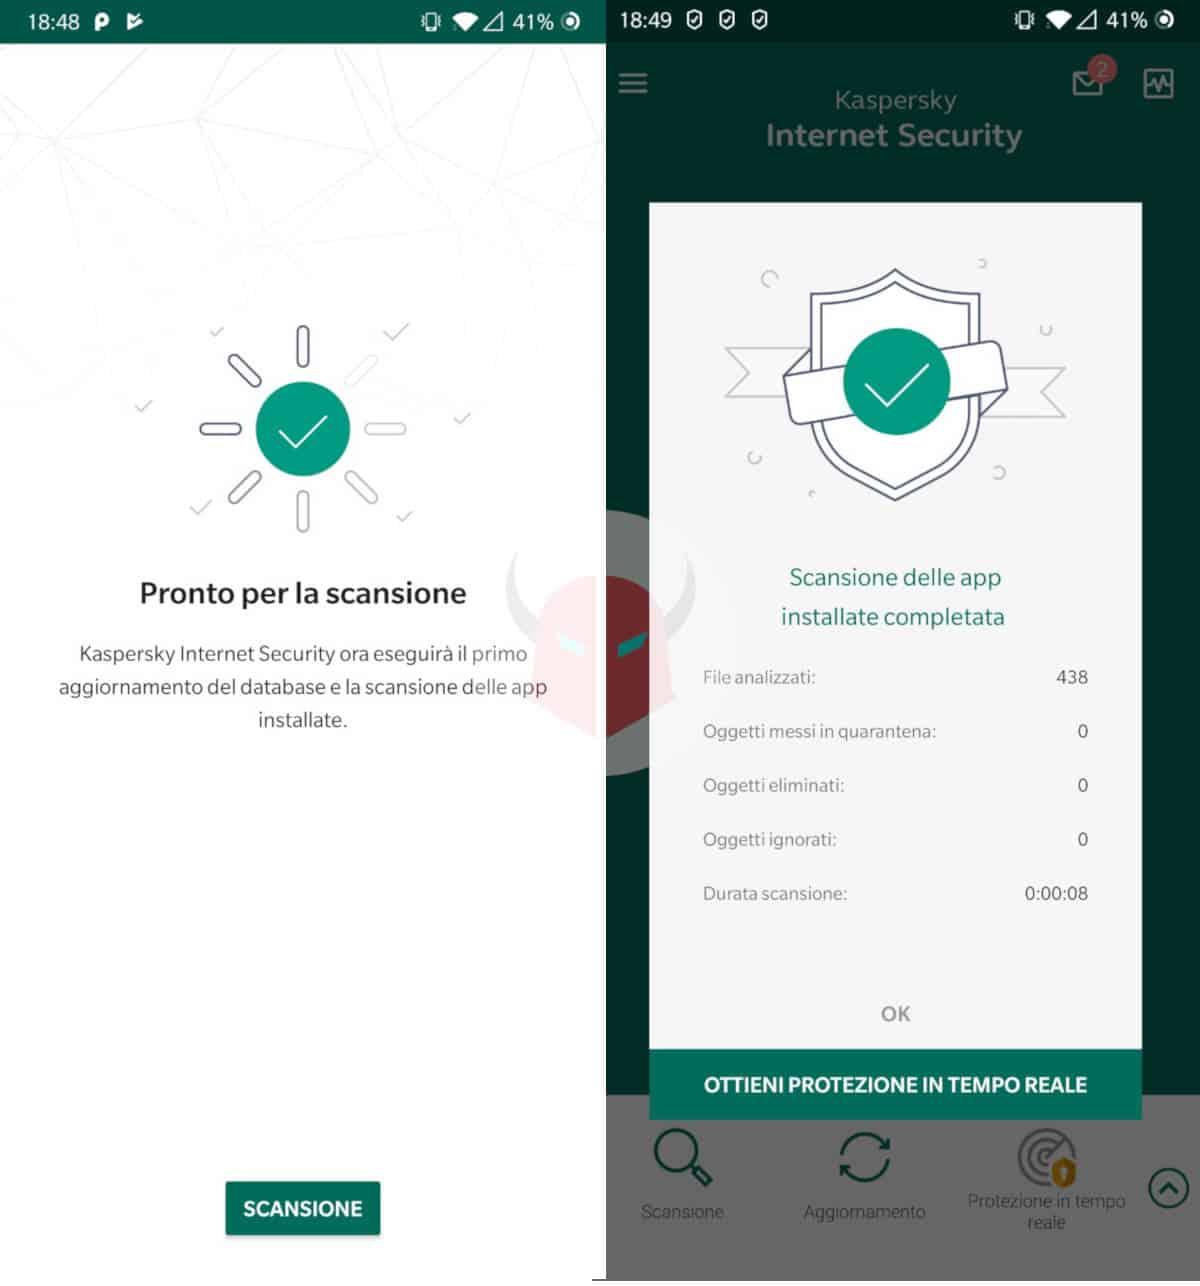 miglior antivirus Android gratis Kaspersky